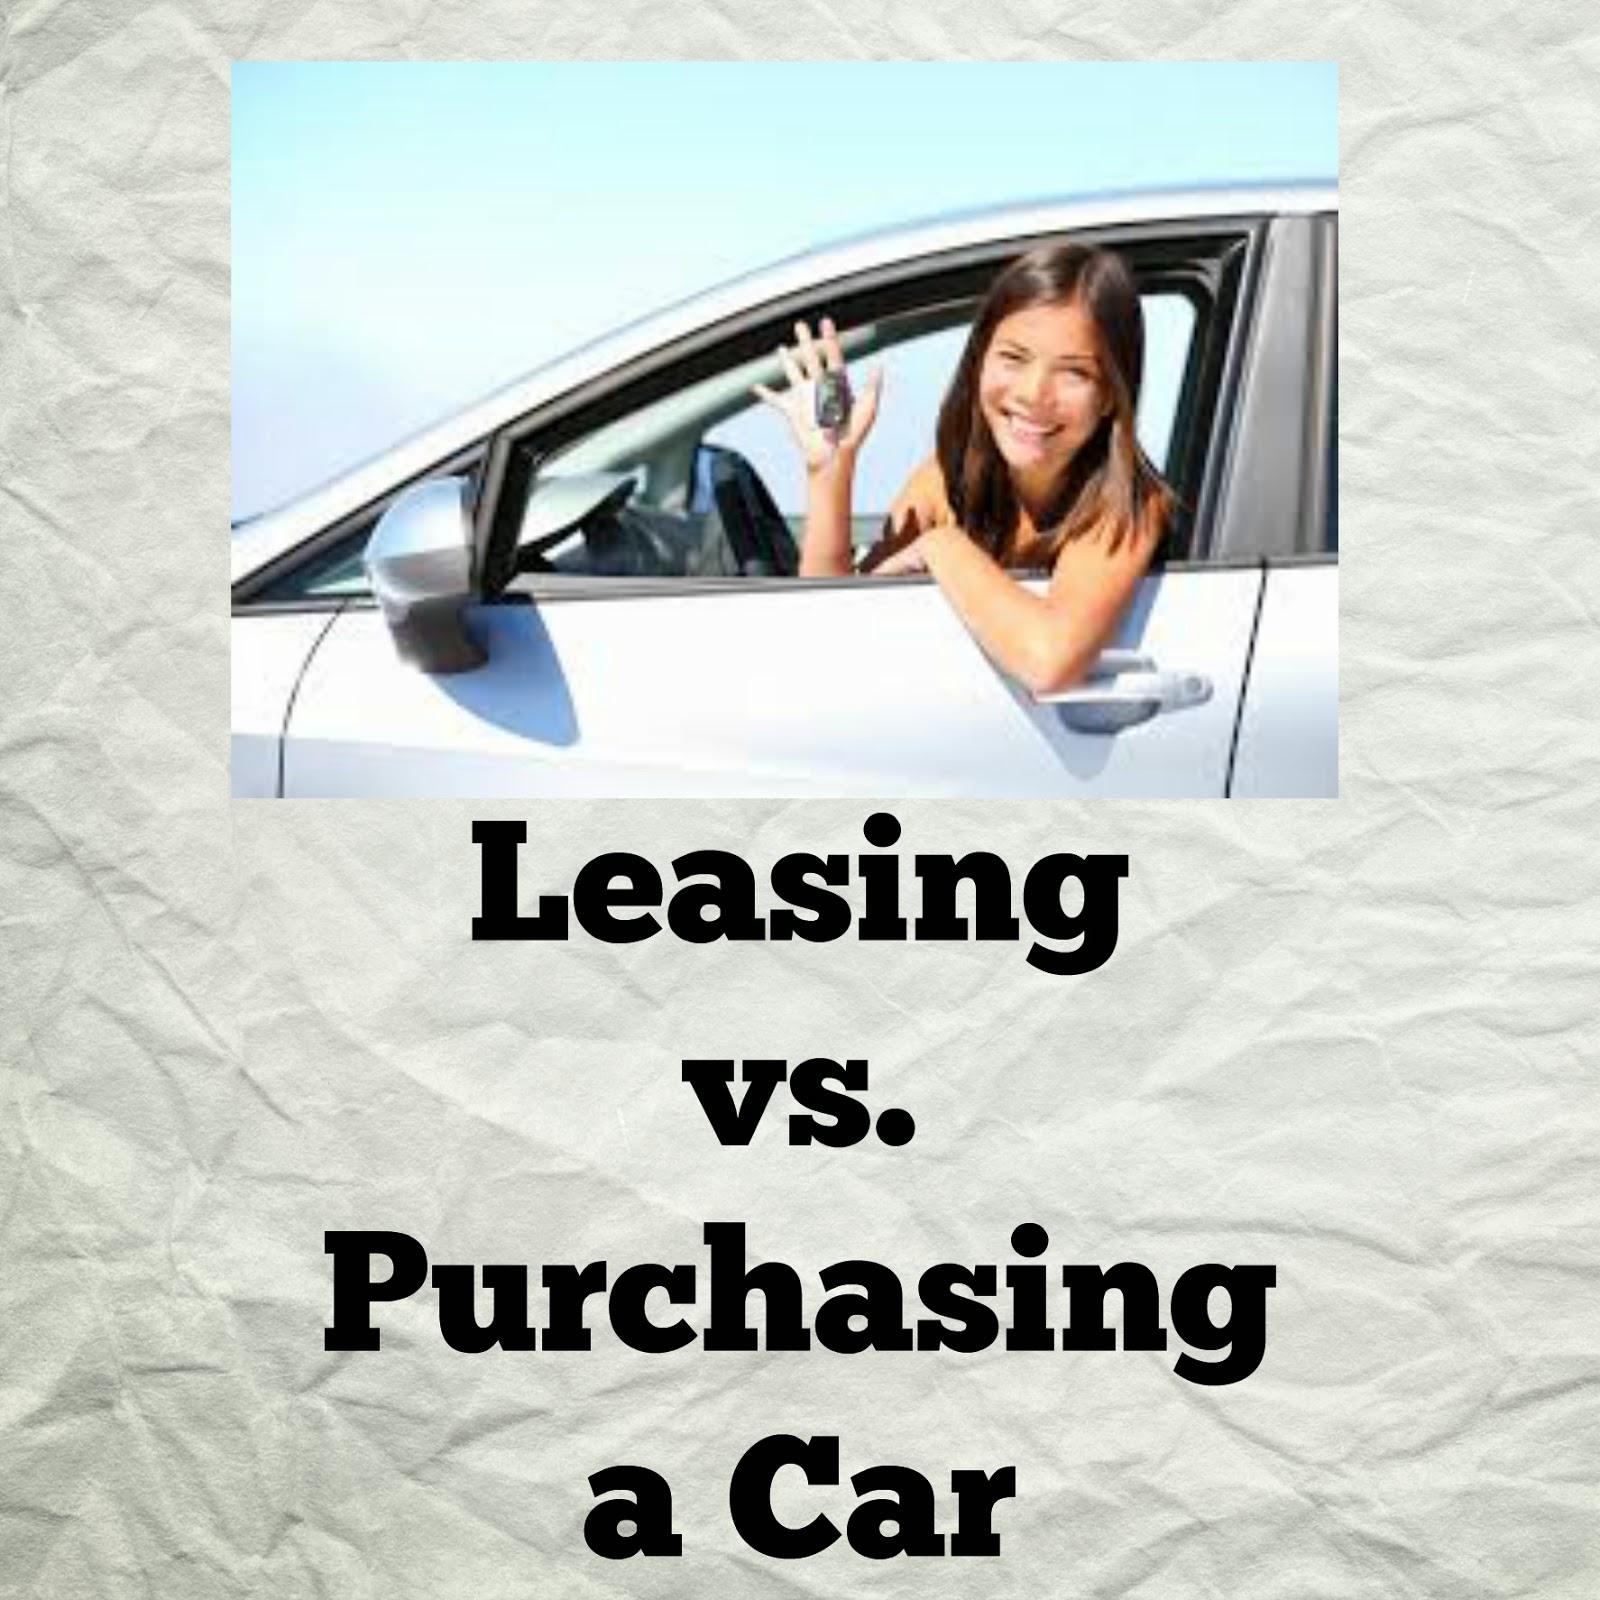 Leasing Vs. Purchasing A Car